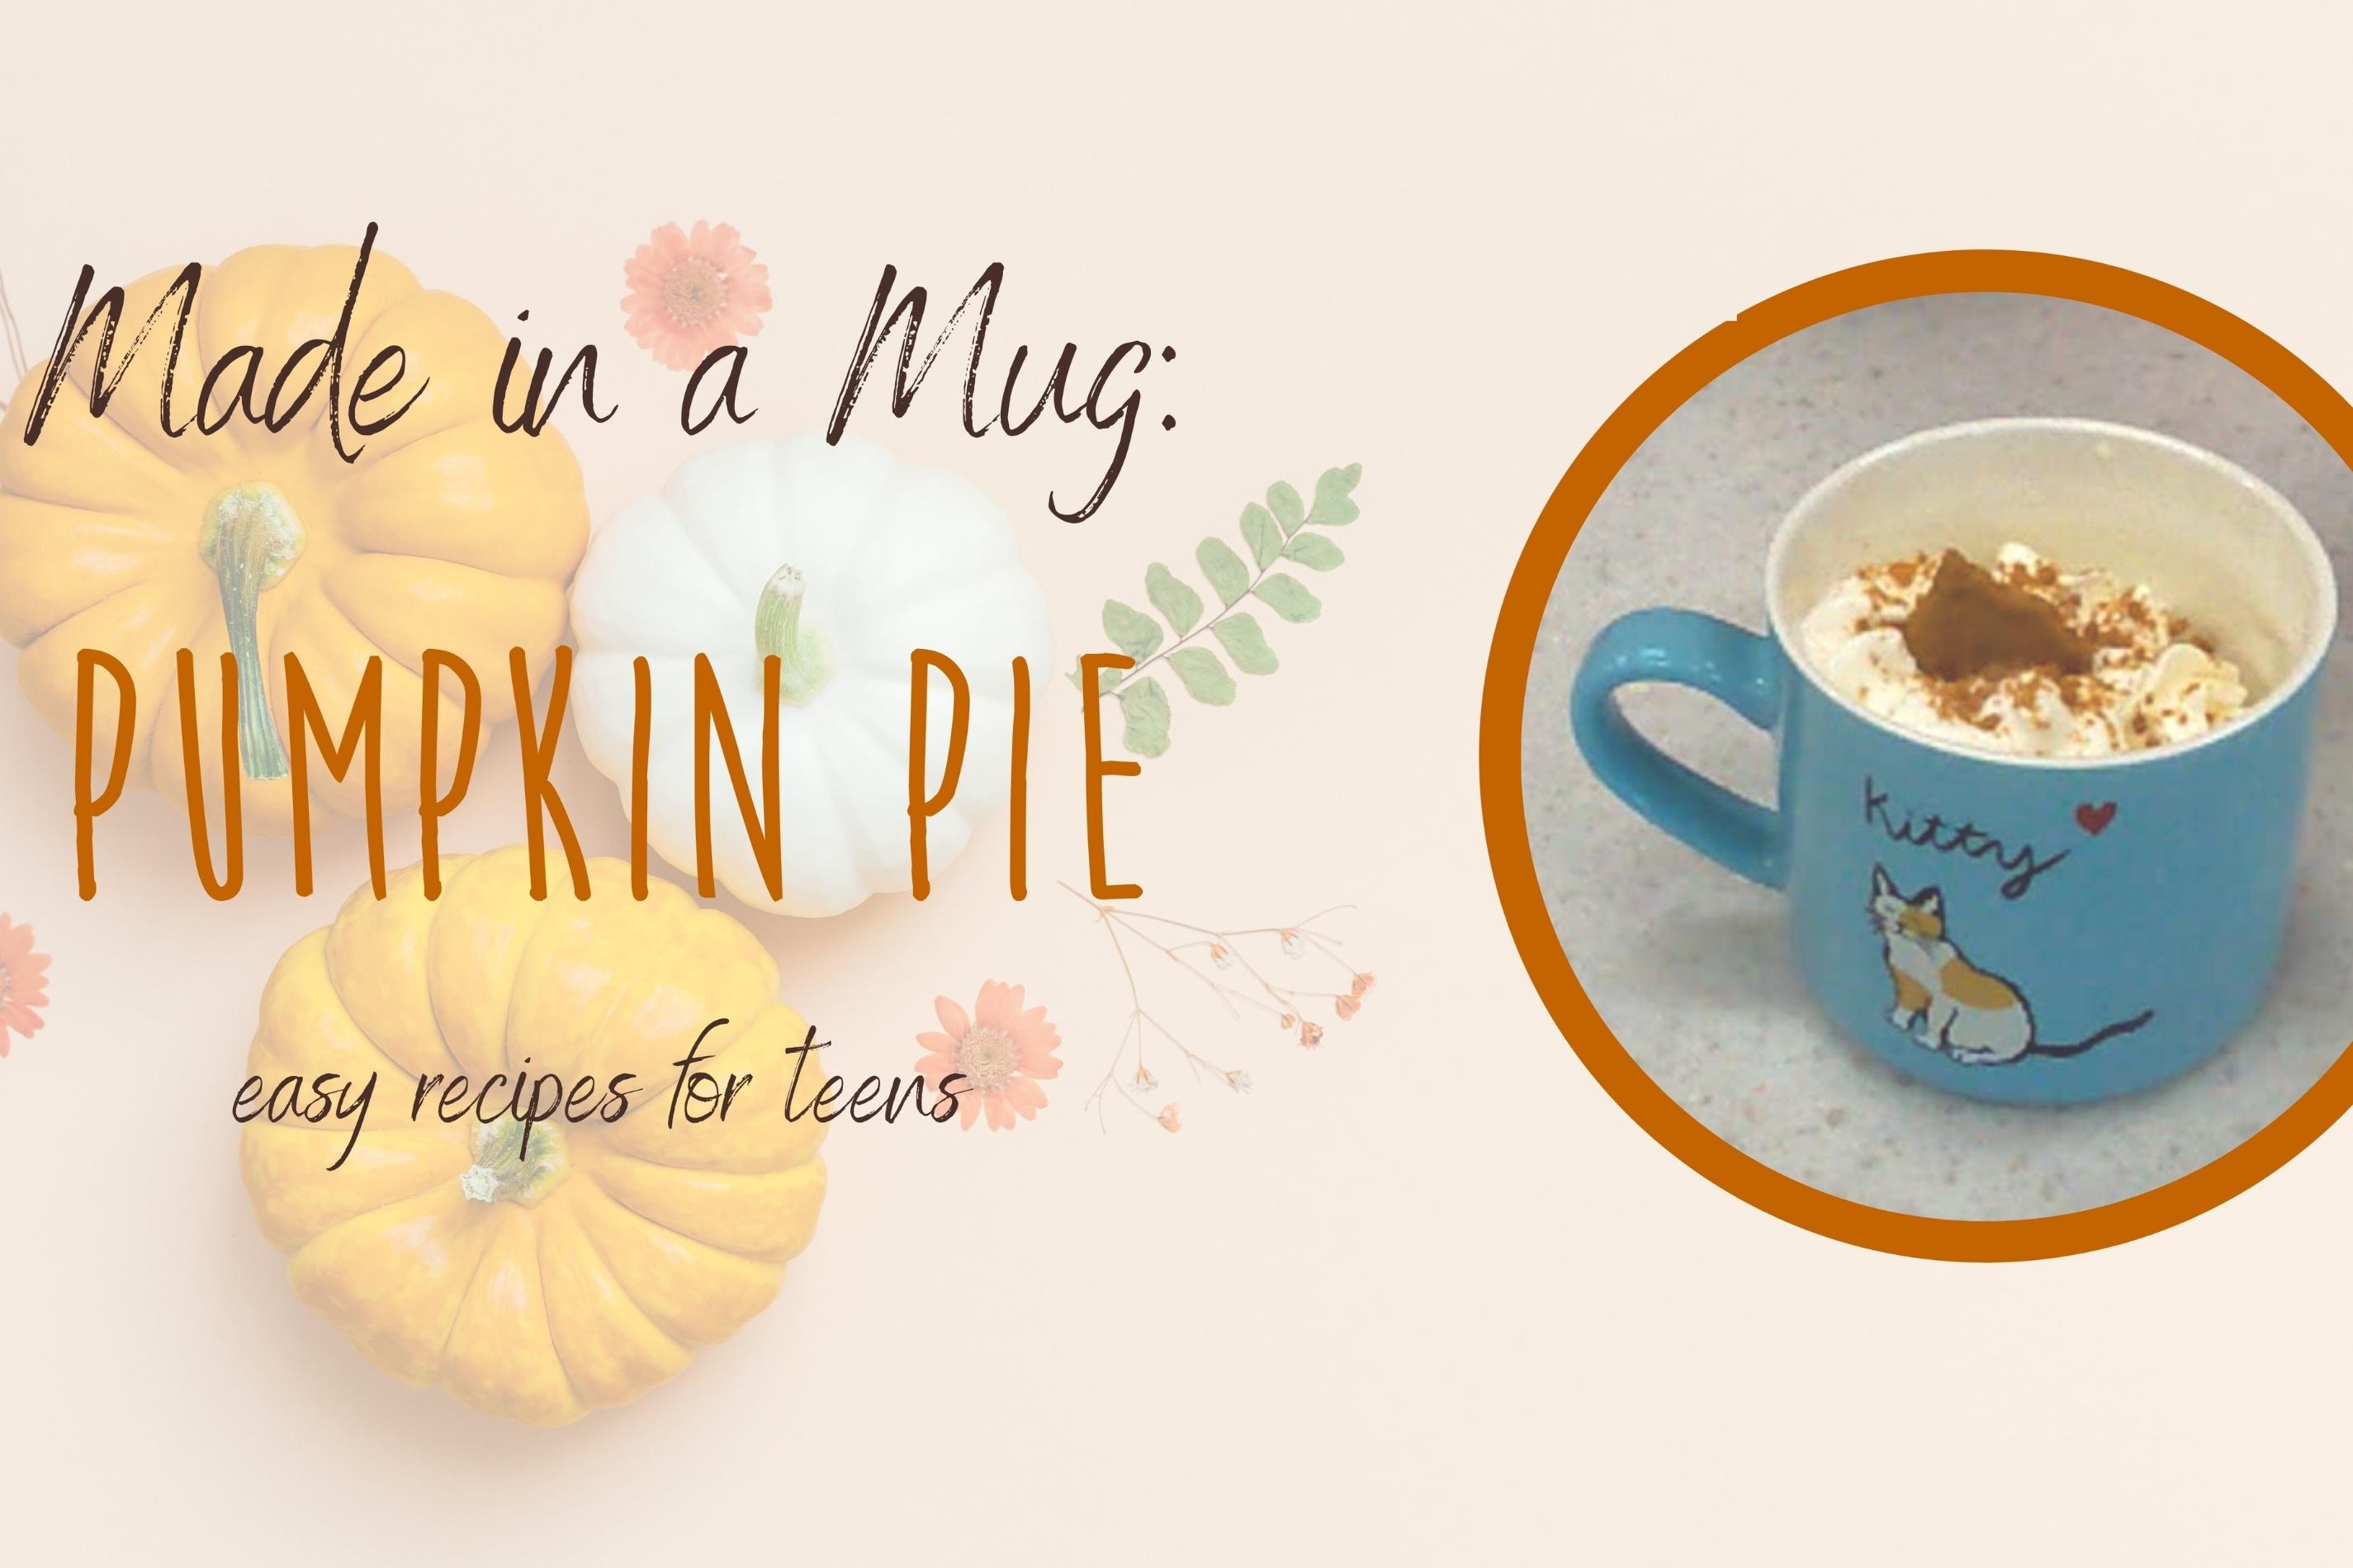 Made in a Mug: Pumpkin Pie